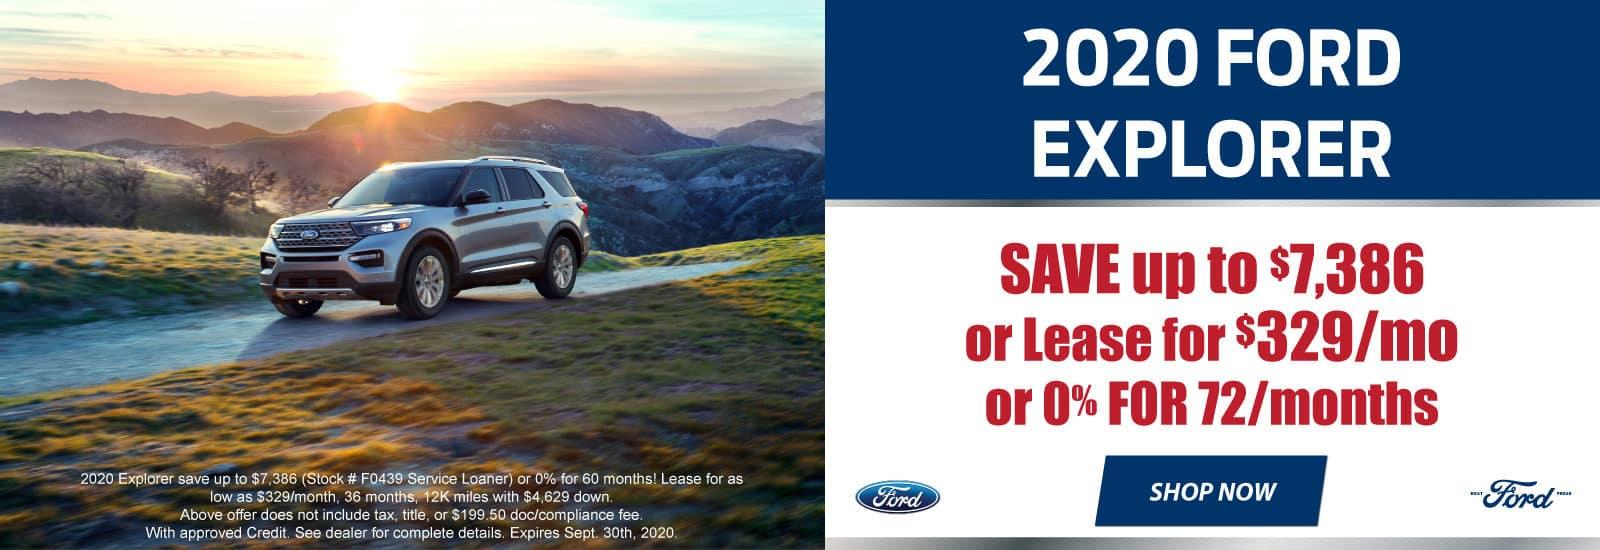 2020-Ford-Explorer-Web-Banner-1600×550